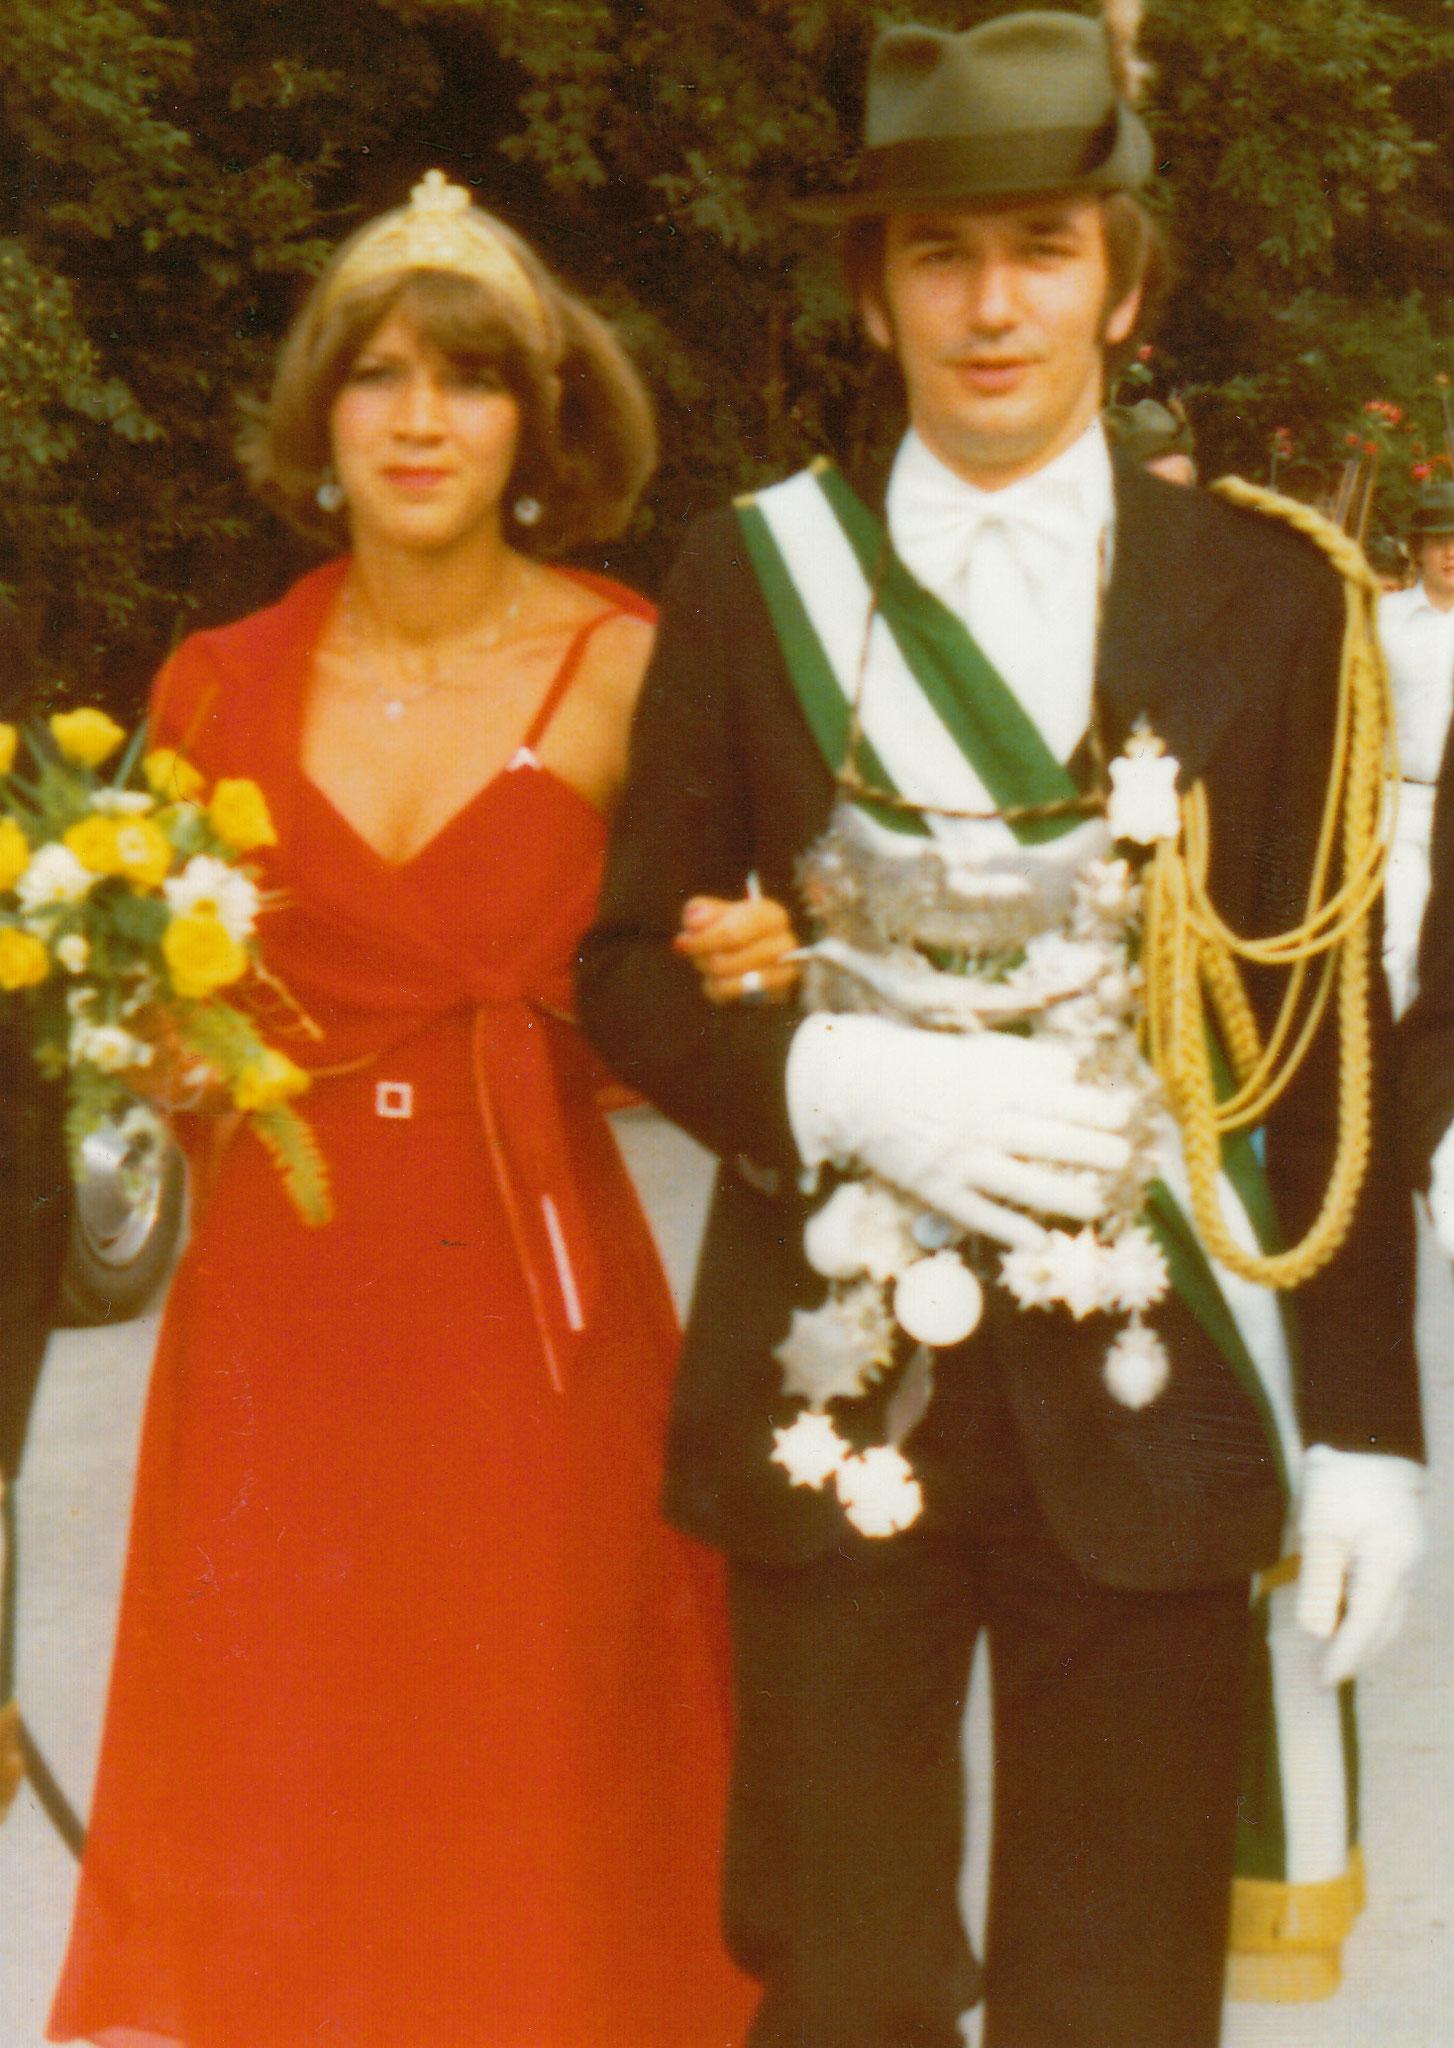 1976 Wolfgang Schulte & Elke Schenkel